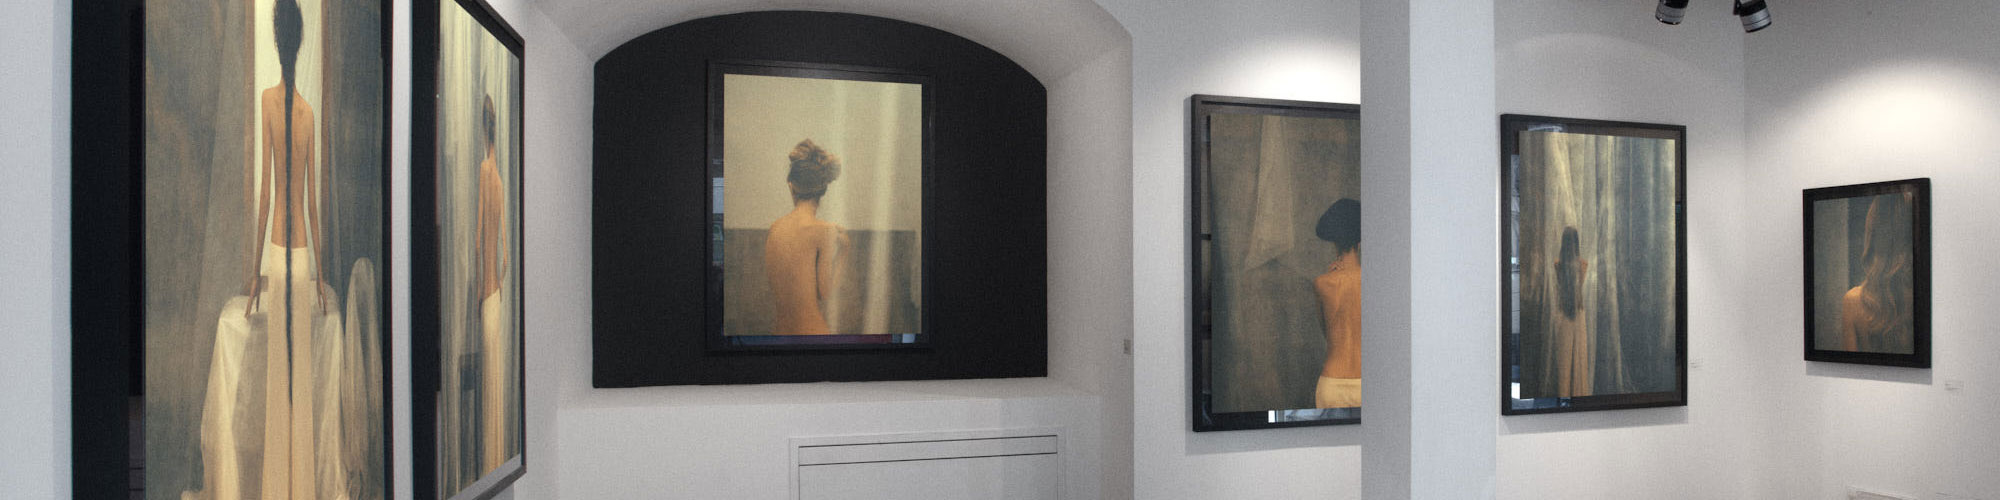 Alessandro_Vasapolli_DéVoilées_Galleria_Biffi_thumb